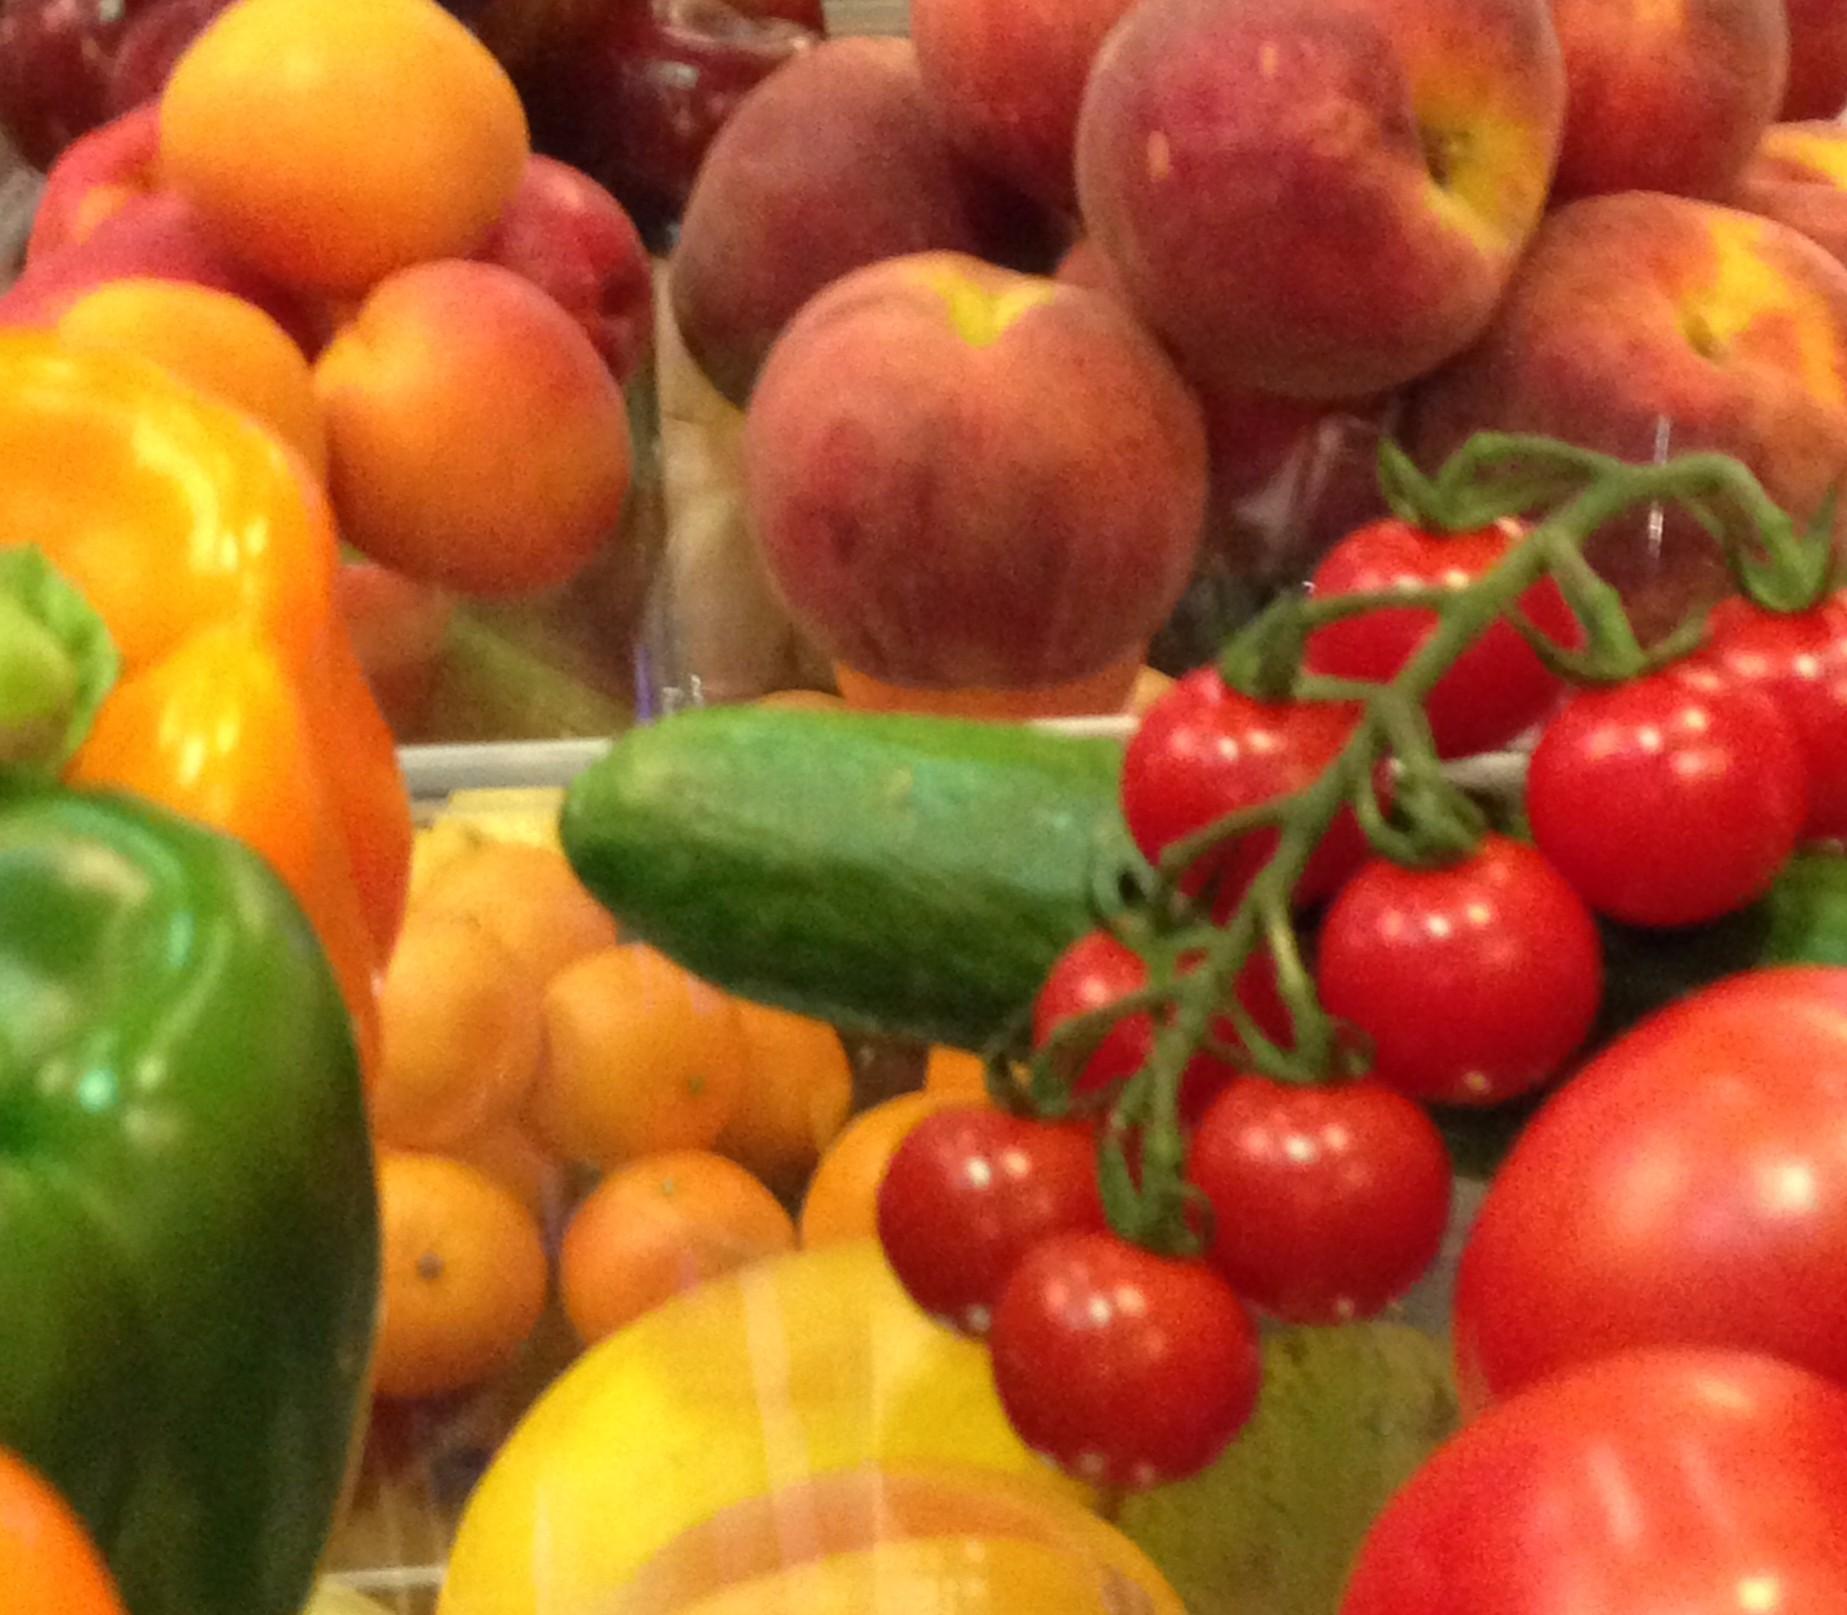 mixed fruit veg - Edited